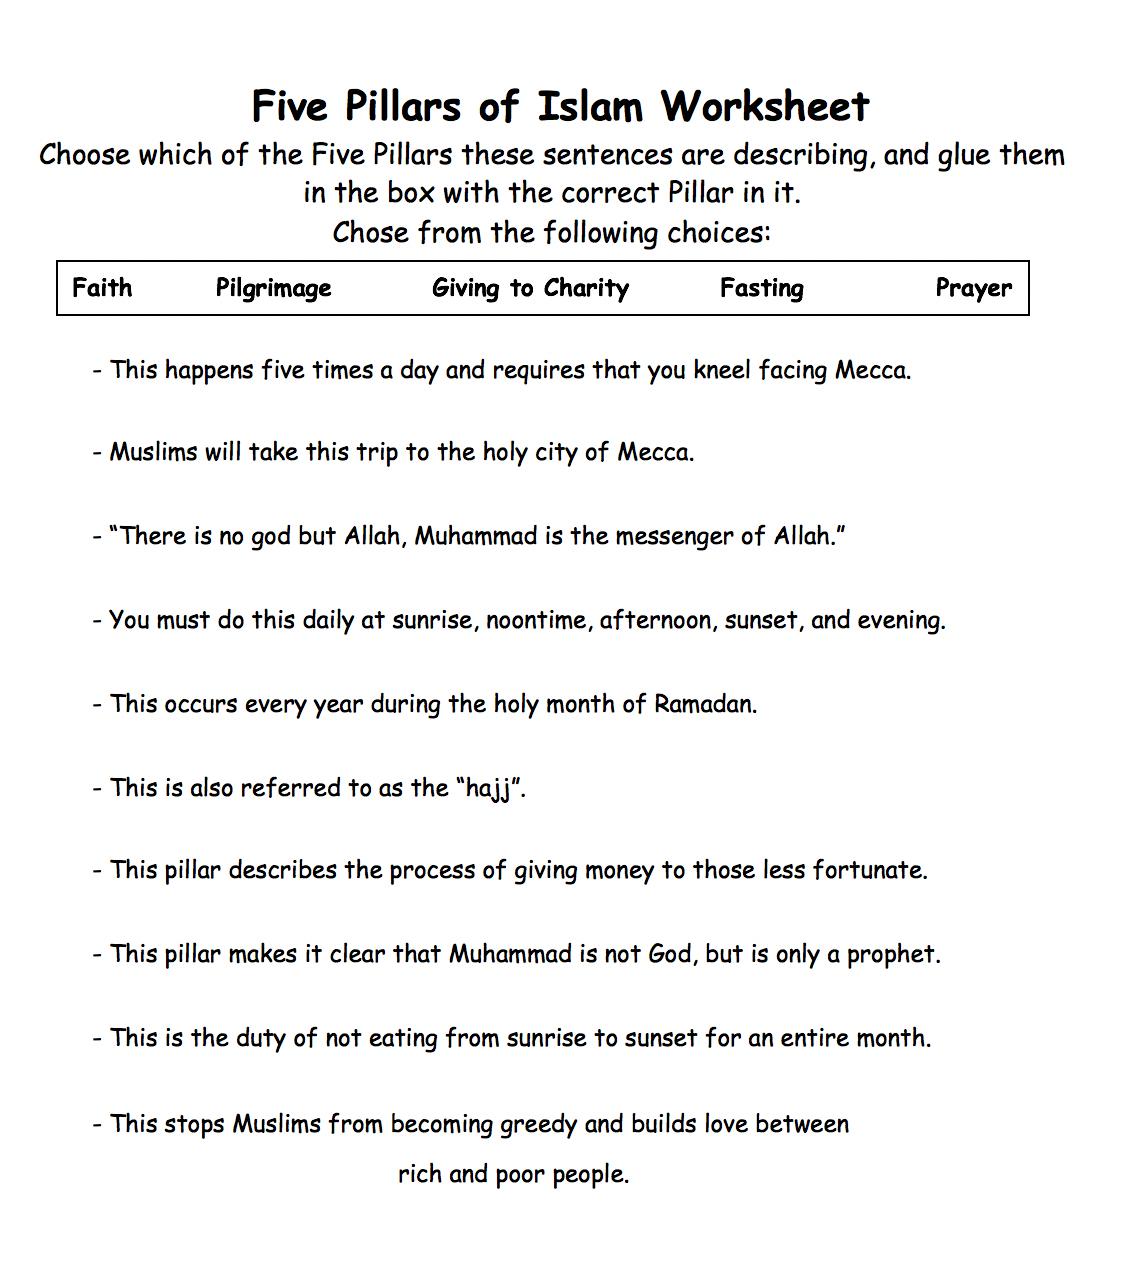 Five Pillars Of Islam Worksheet